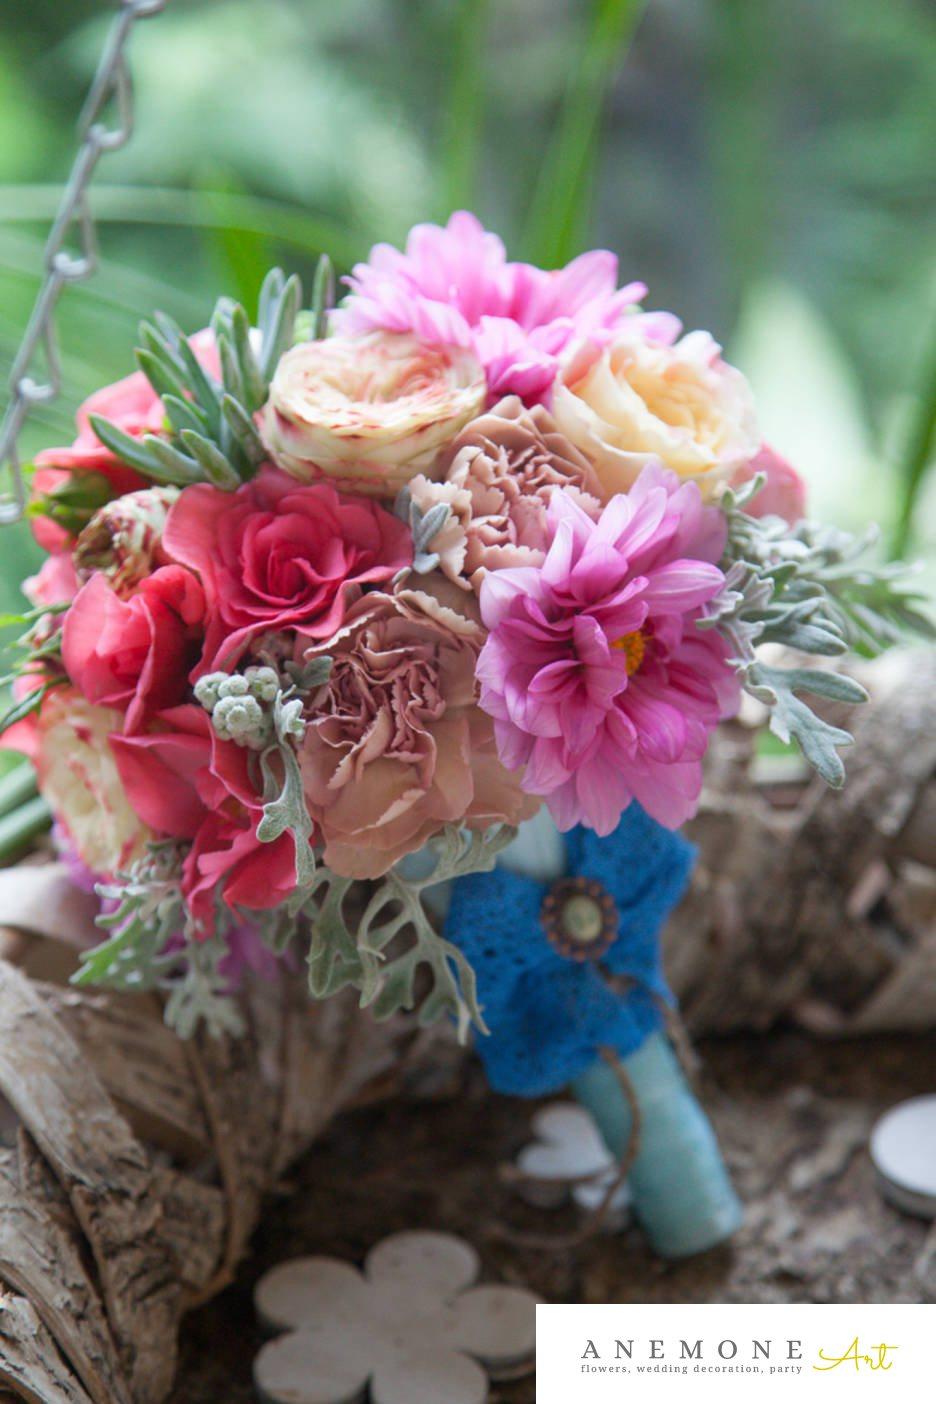 Poza, foto cu Flori de nunta buchet cununie, bujori, hortensia, maner buchet in Arad, Timisoara, Oradea (wedding flowers, bouquets) nunta Arad